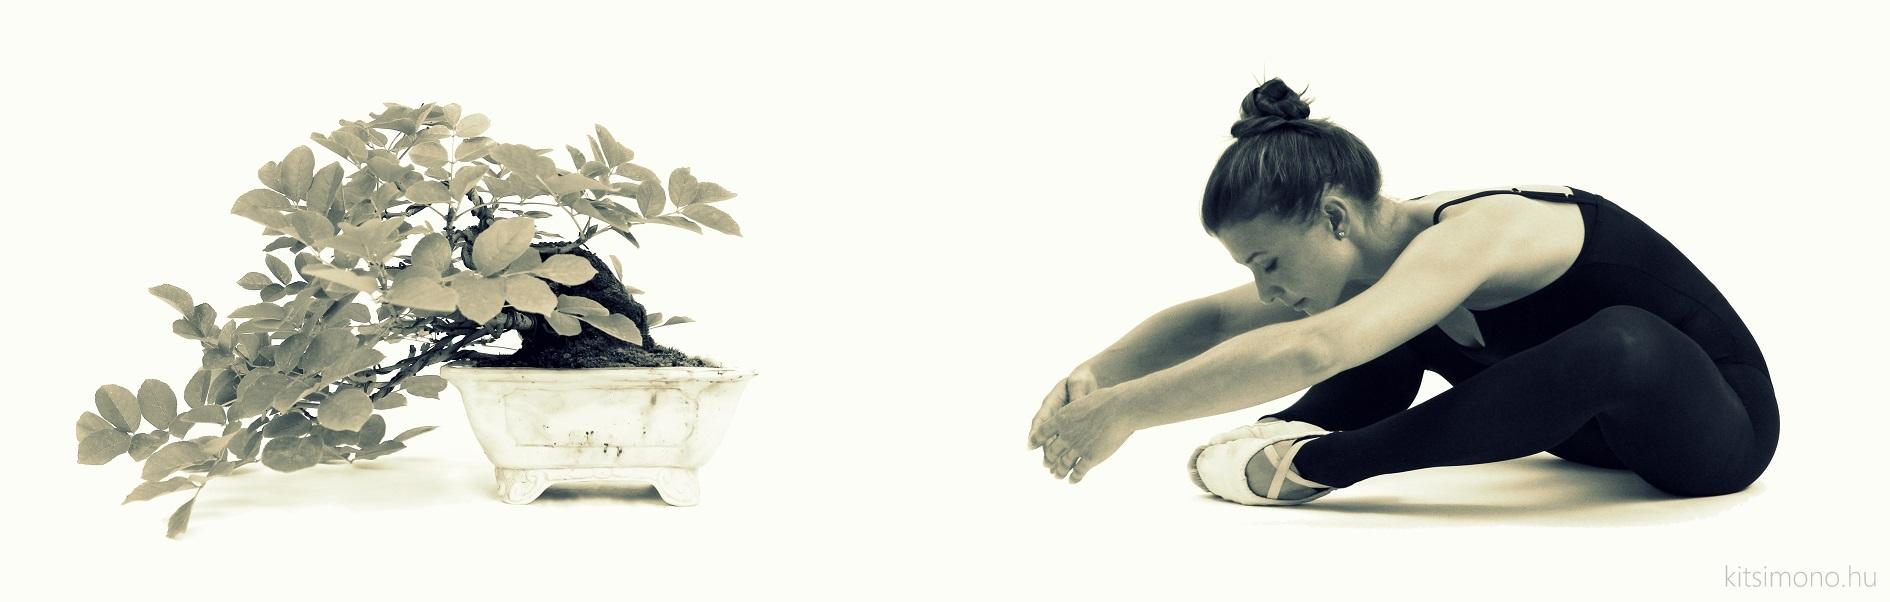 fraxinus ornus kőris shohin han kengai bonsai style kitsimono (14)